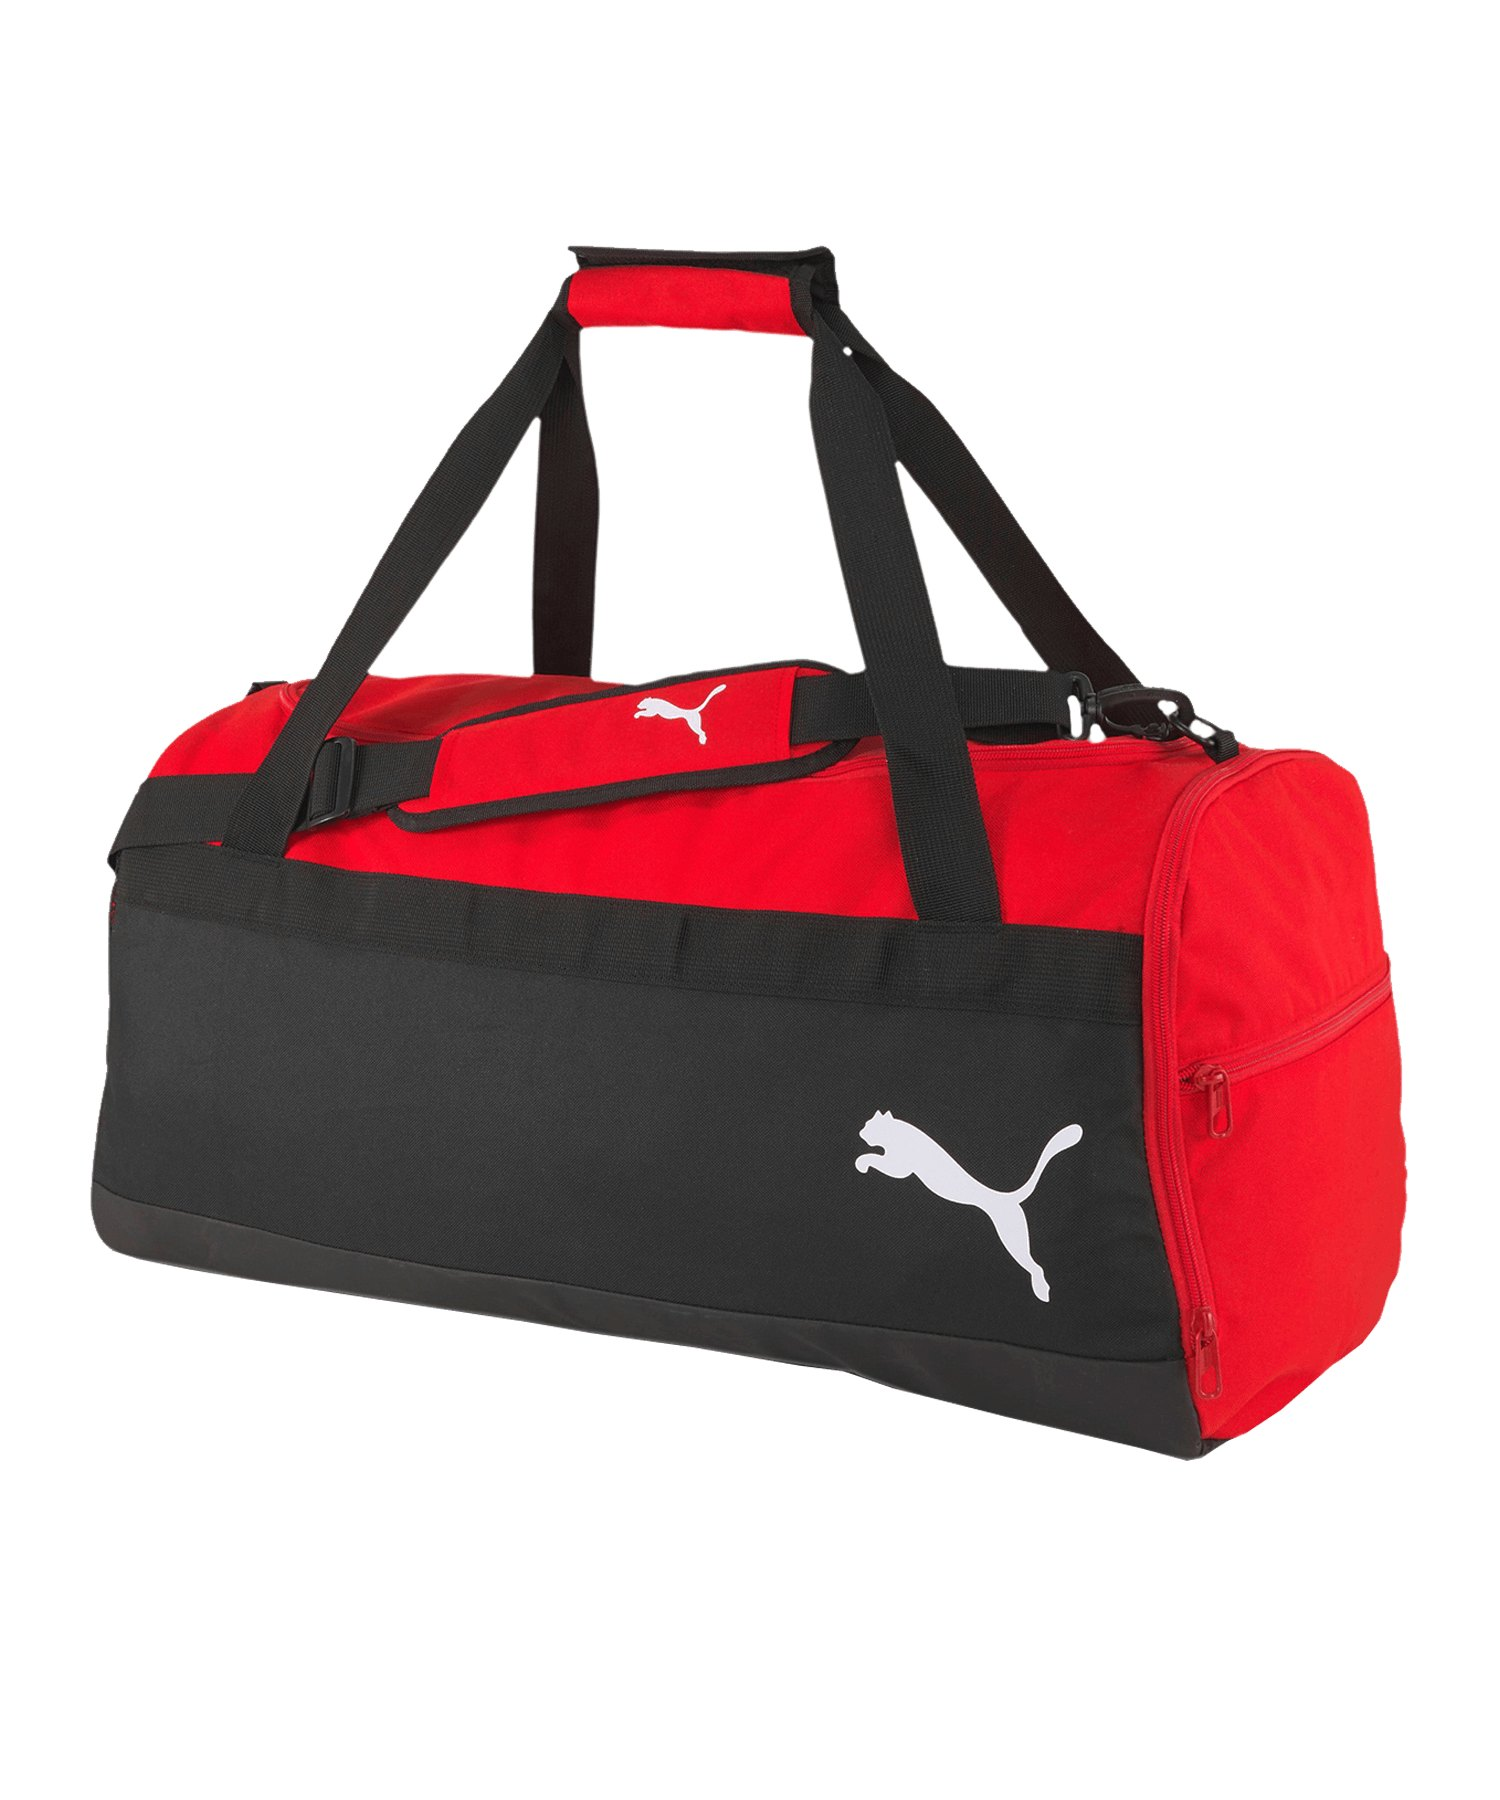 PUMA teamGOAL 23 Teambag Sporttasche Gr. M F01 - rot